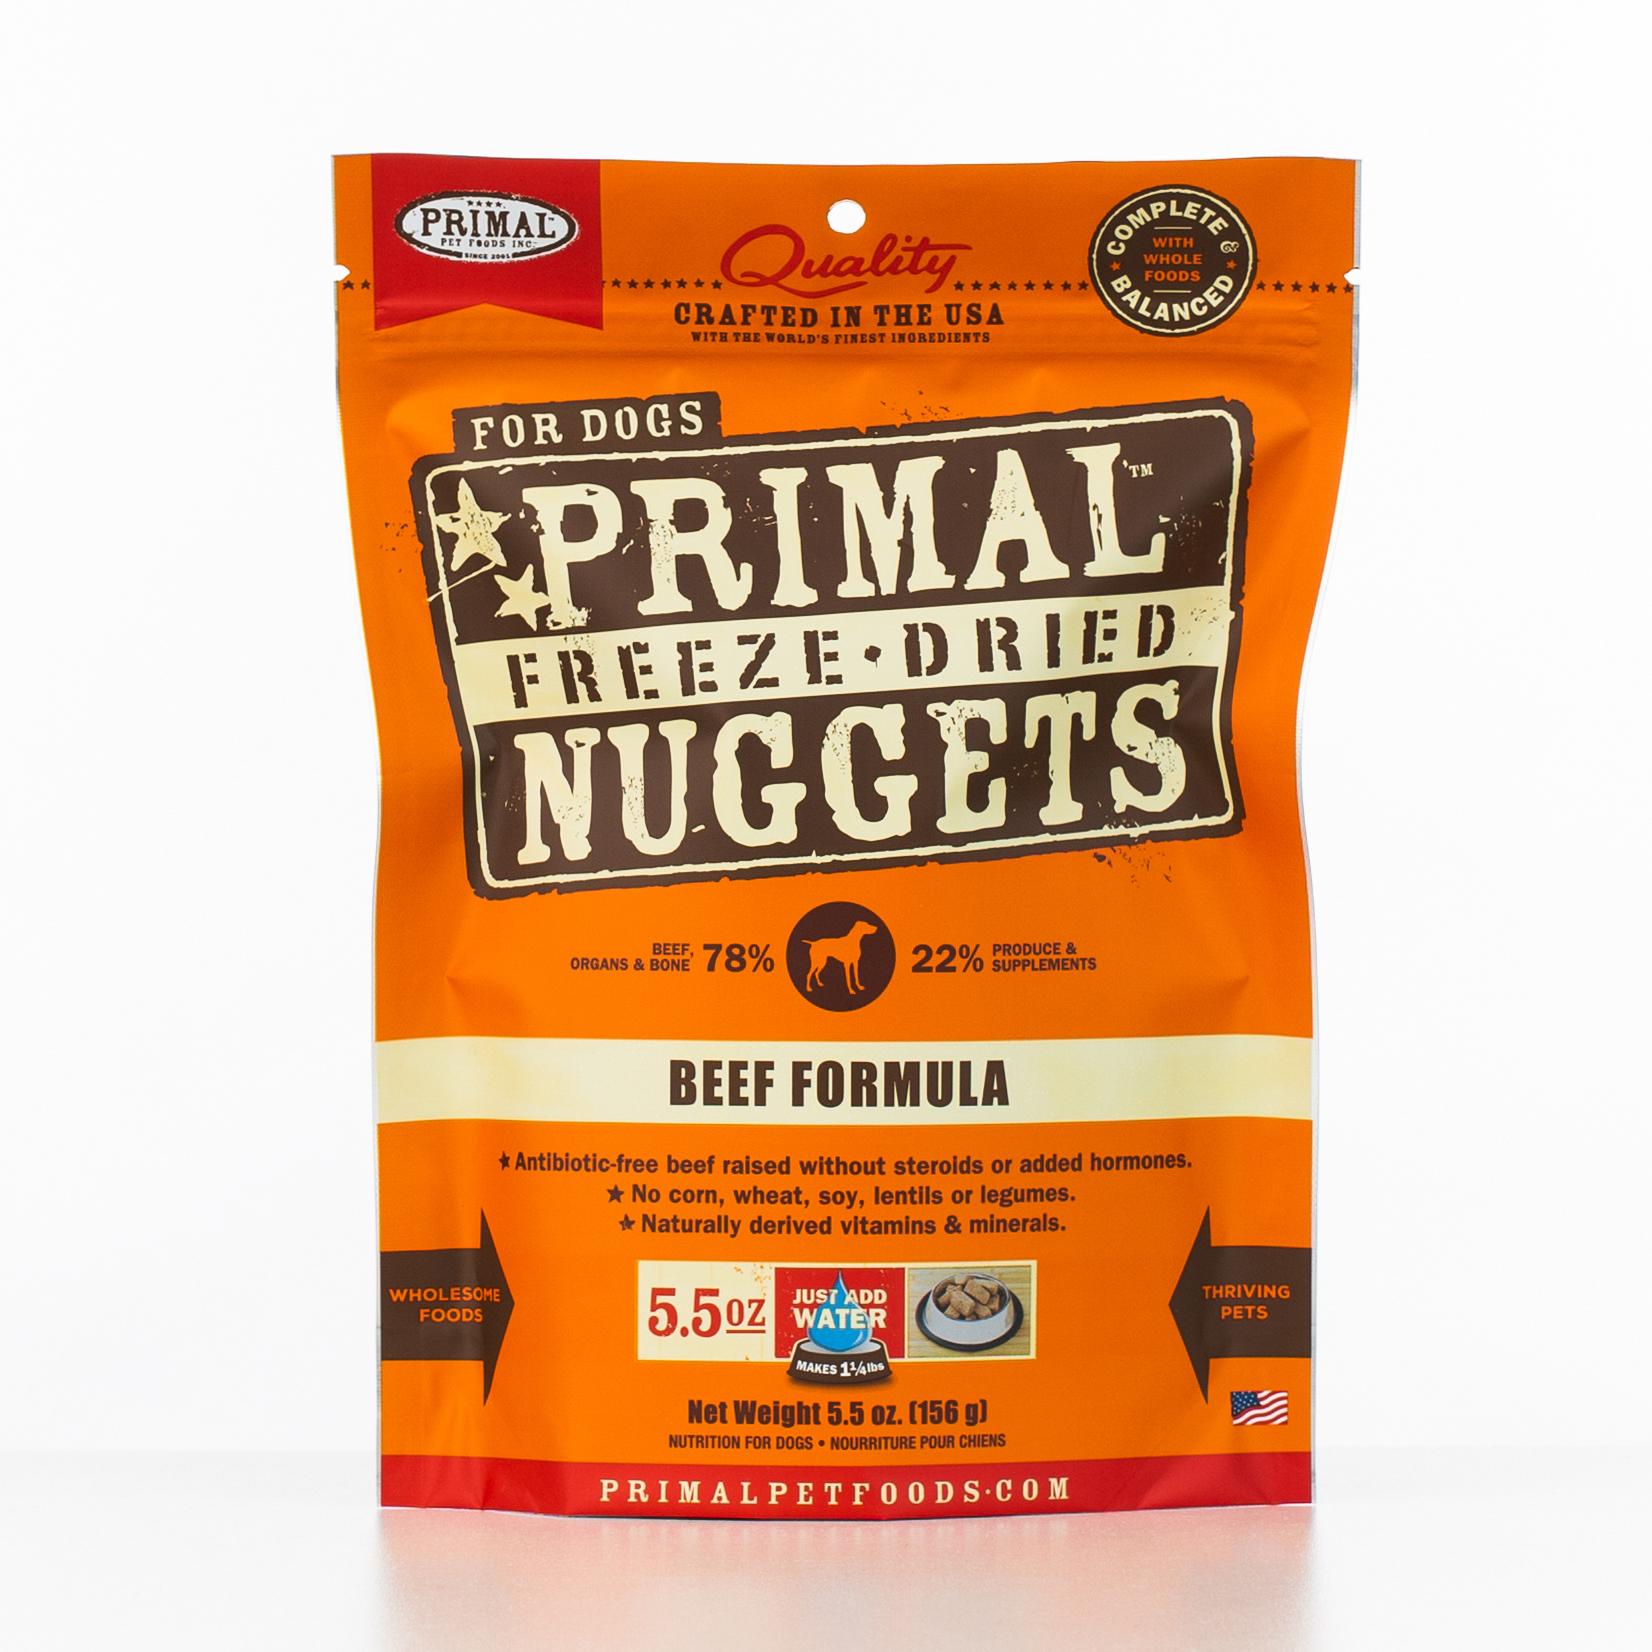 Primal Raw Freeze-Dried Nuggets Beef Formula Dog Food, 5.5-oz bag Size: 5.5-oz bag, Weights: 5.5ounces